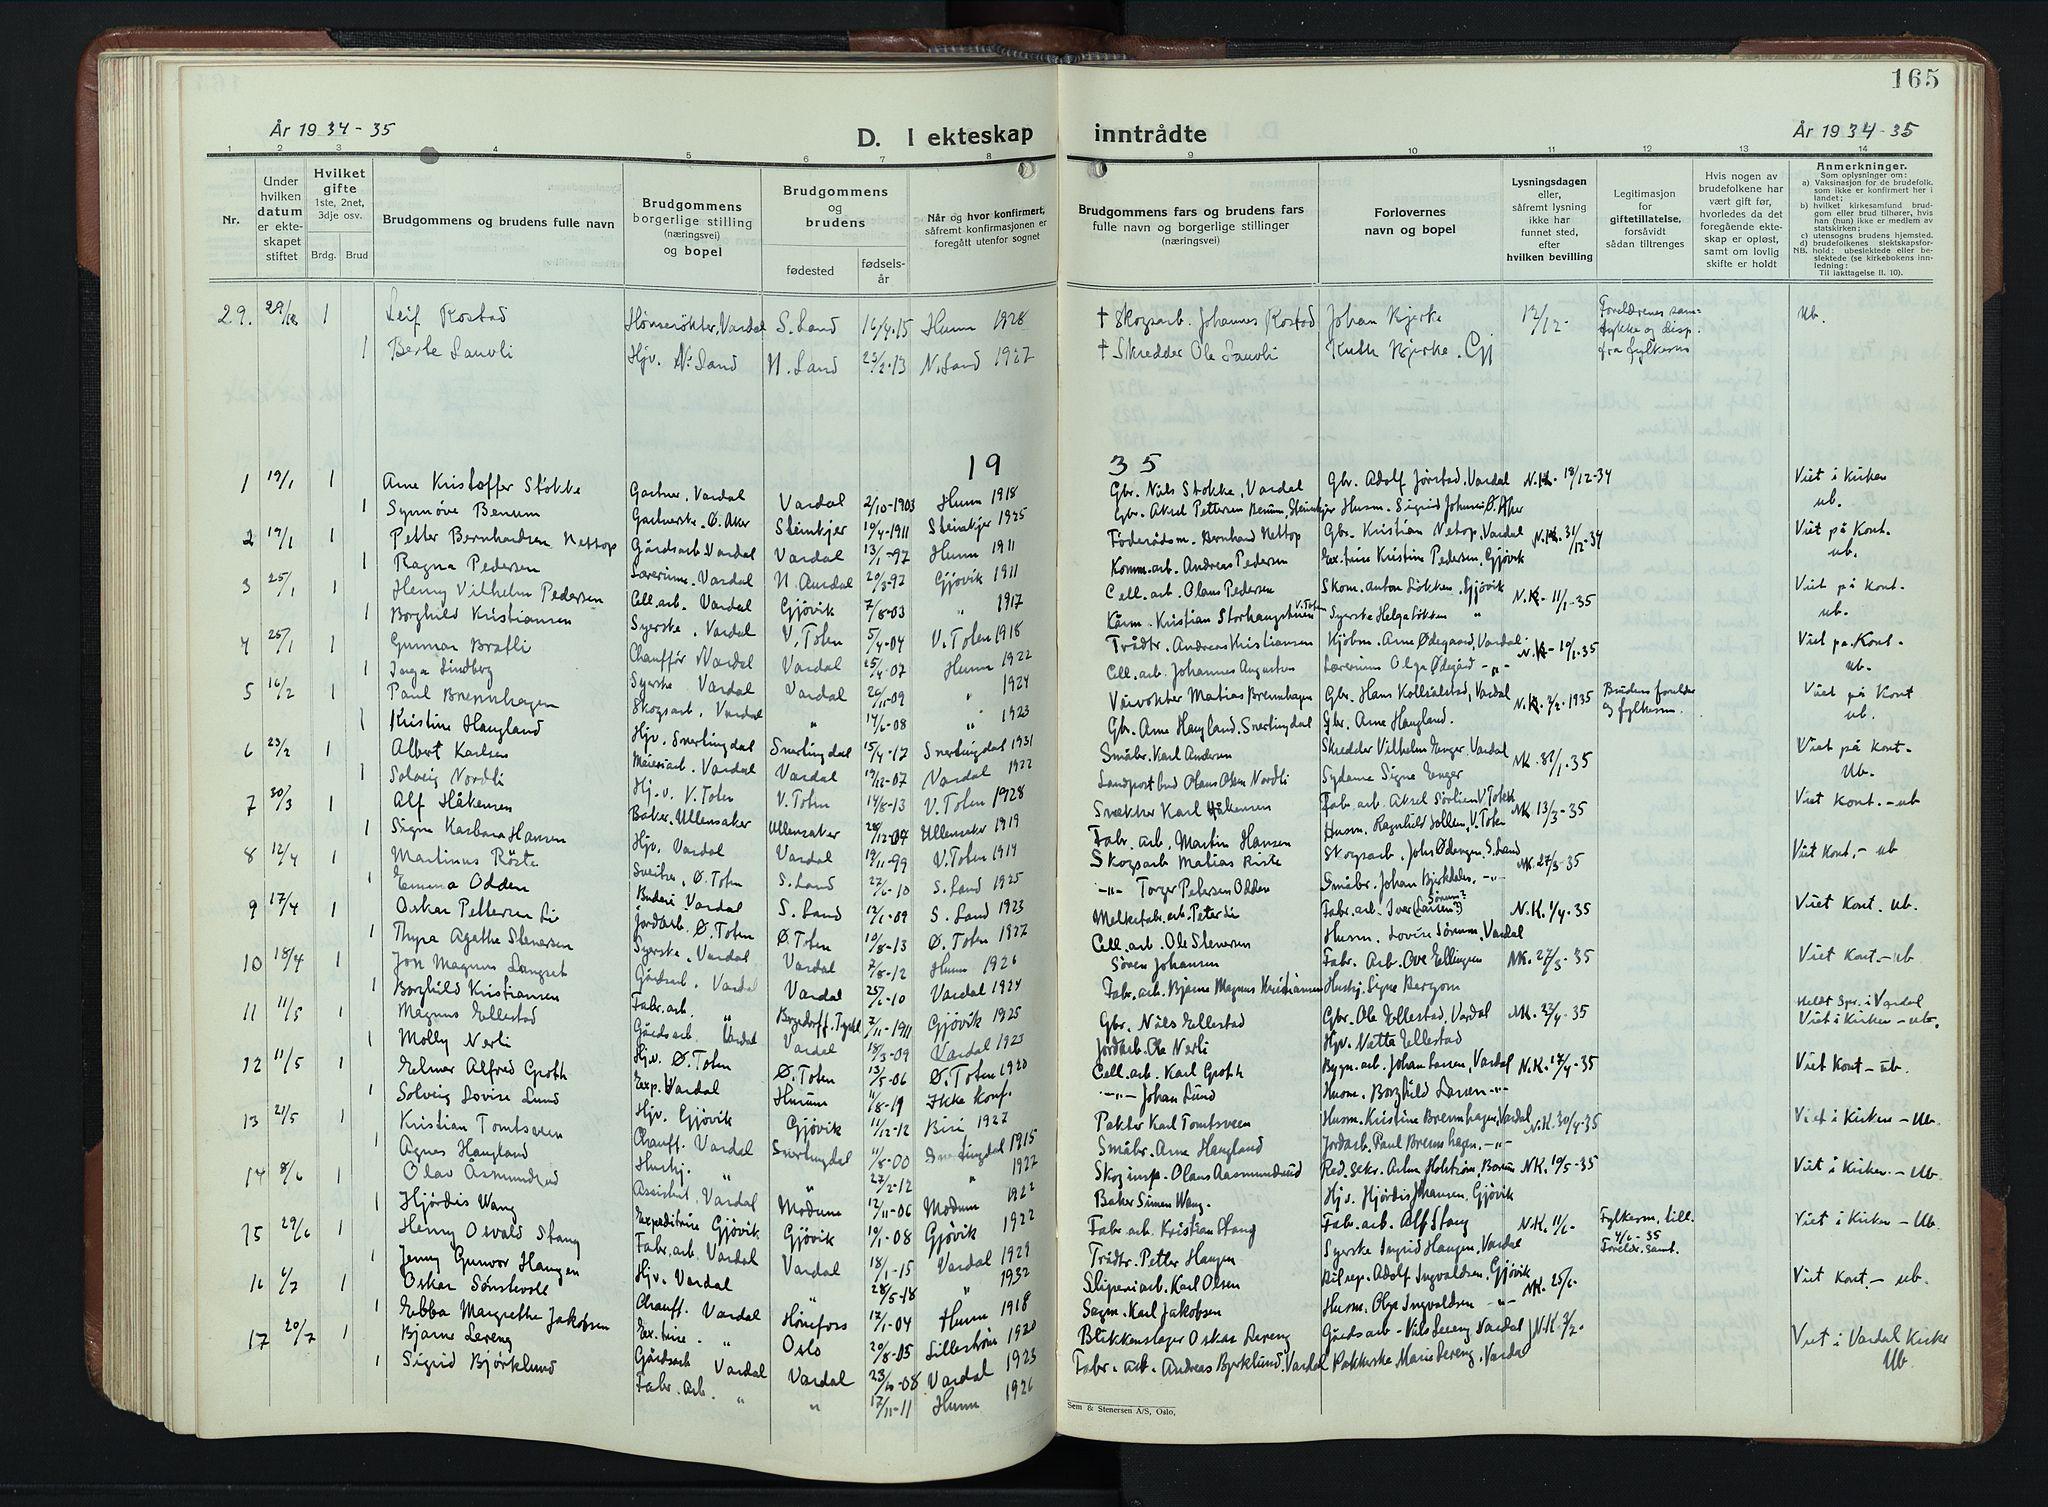 SAH, Vardal prestekontor, H/Ha/Hab/L0023: Klokkerbok nr. 23, 1929-1941, s. 165